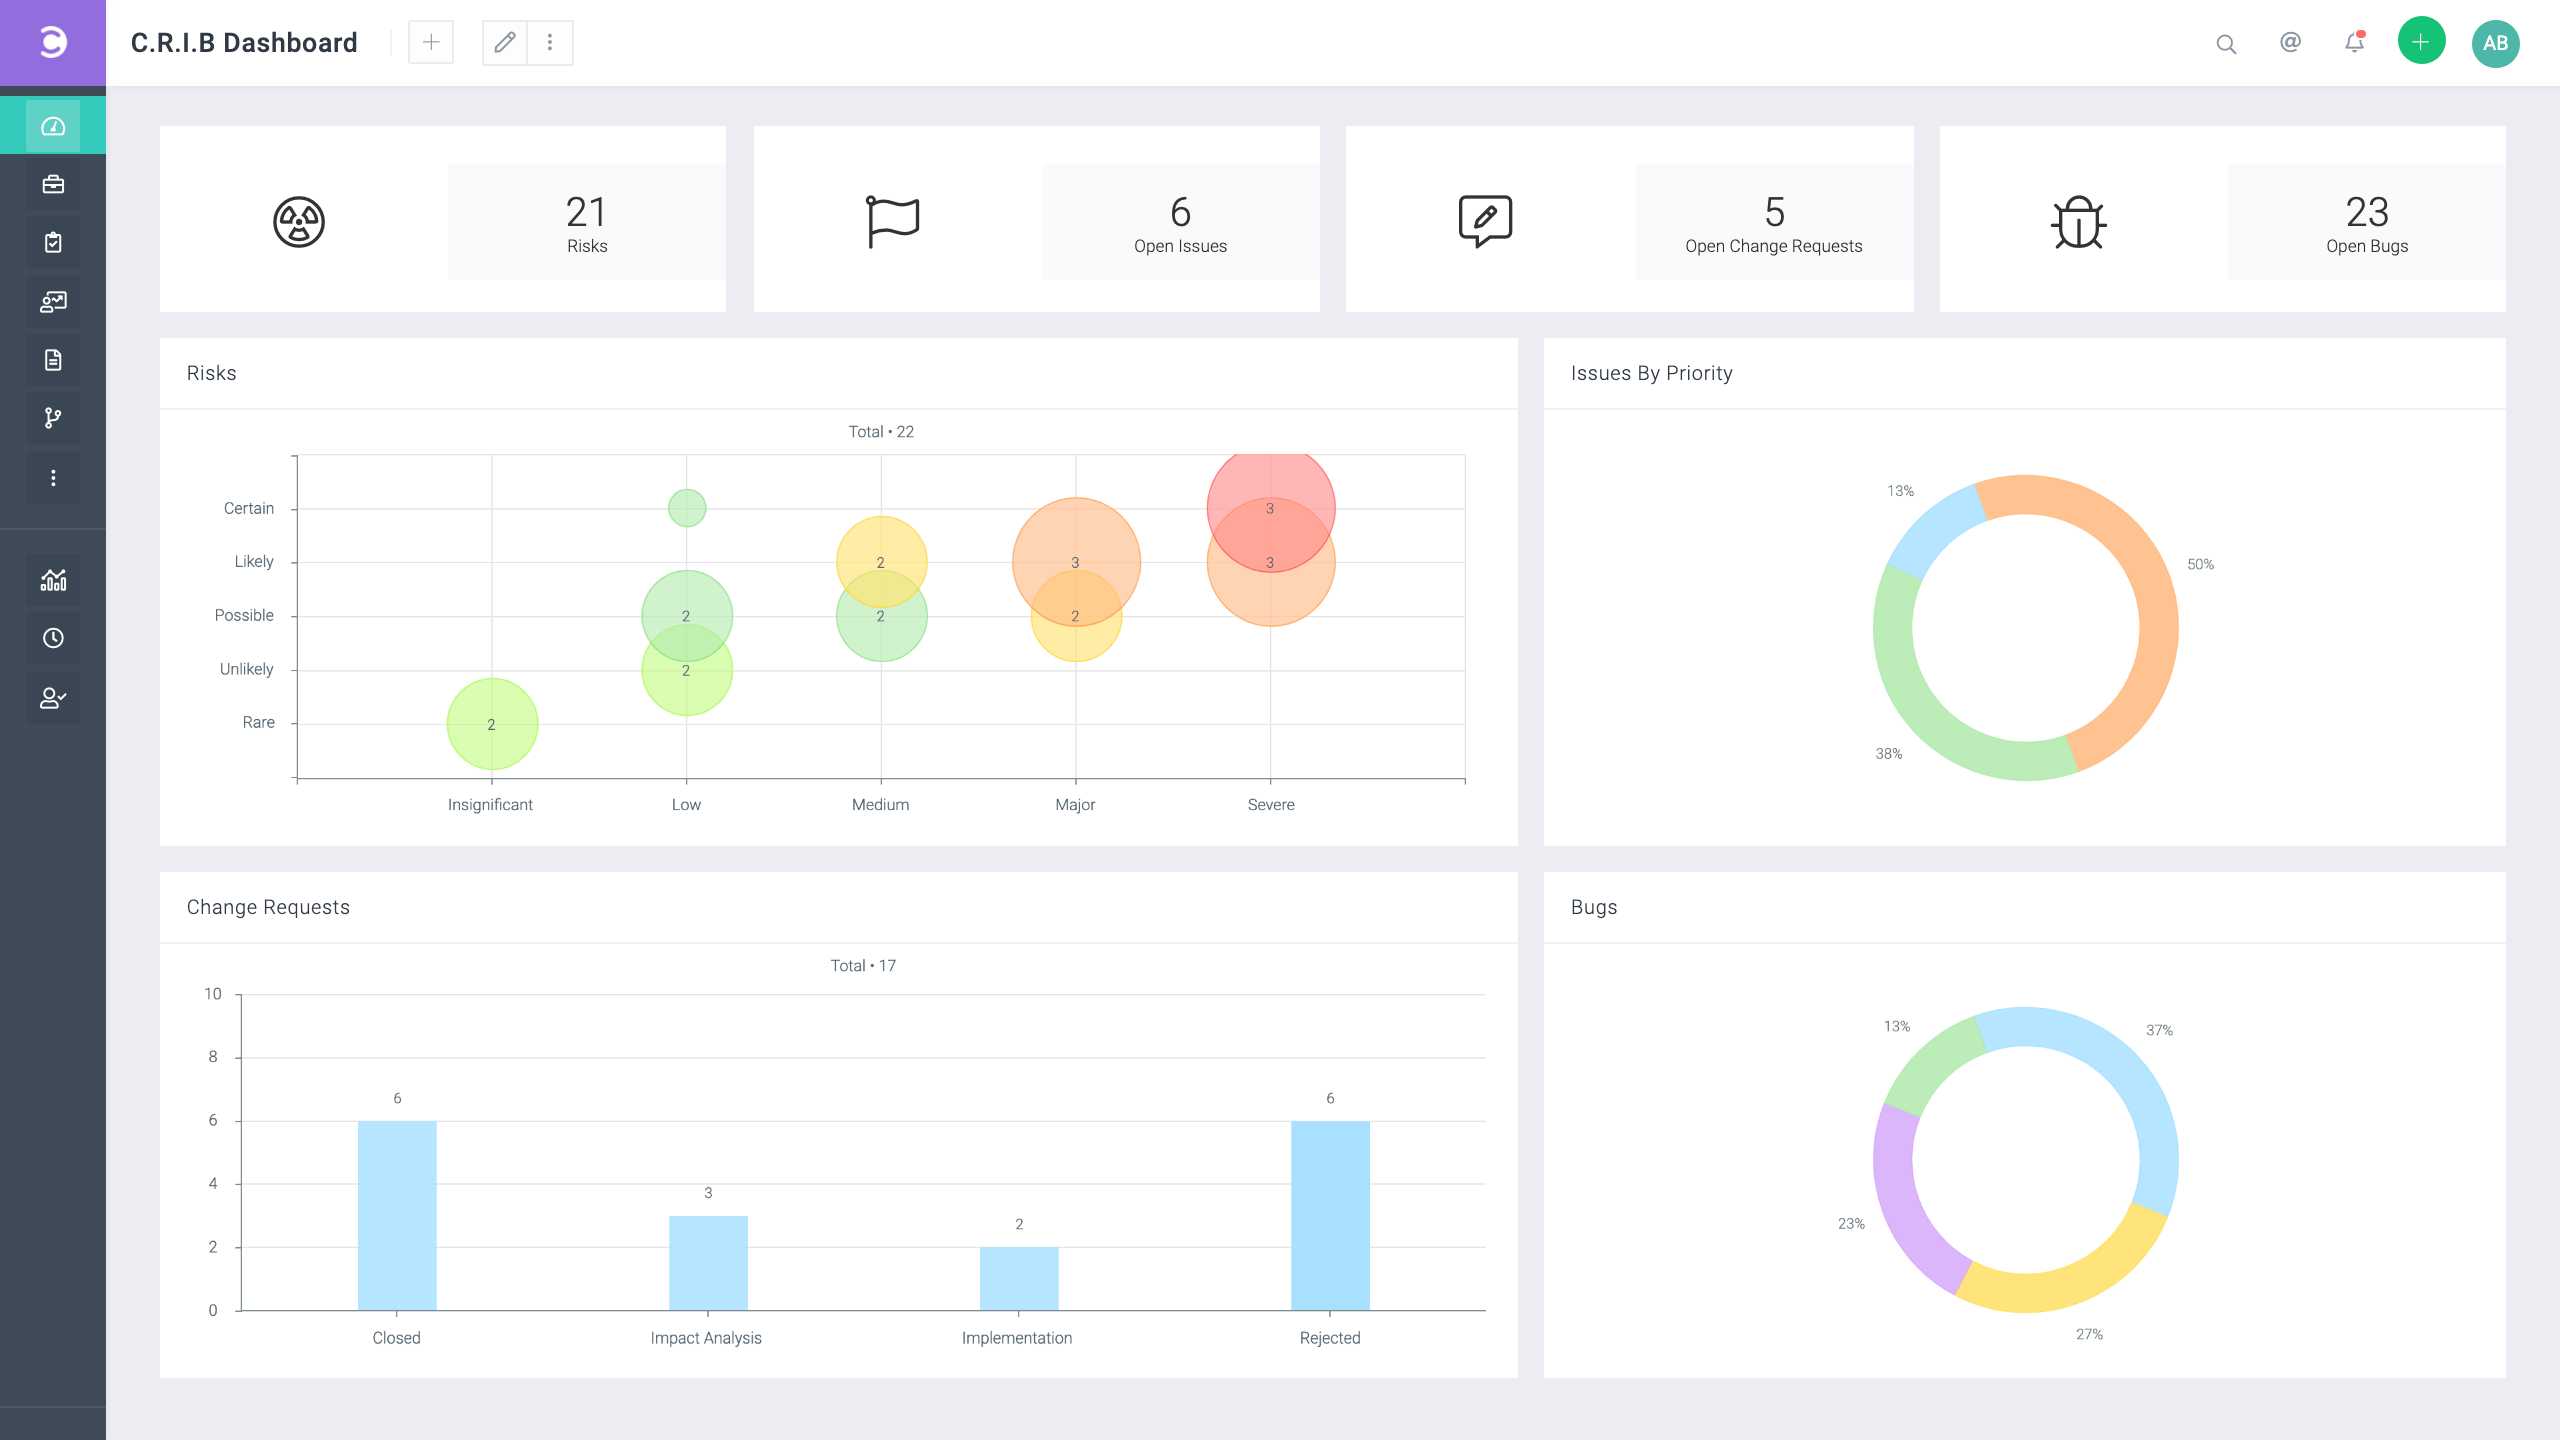 Celoxis-crib-dashboard